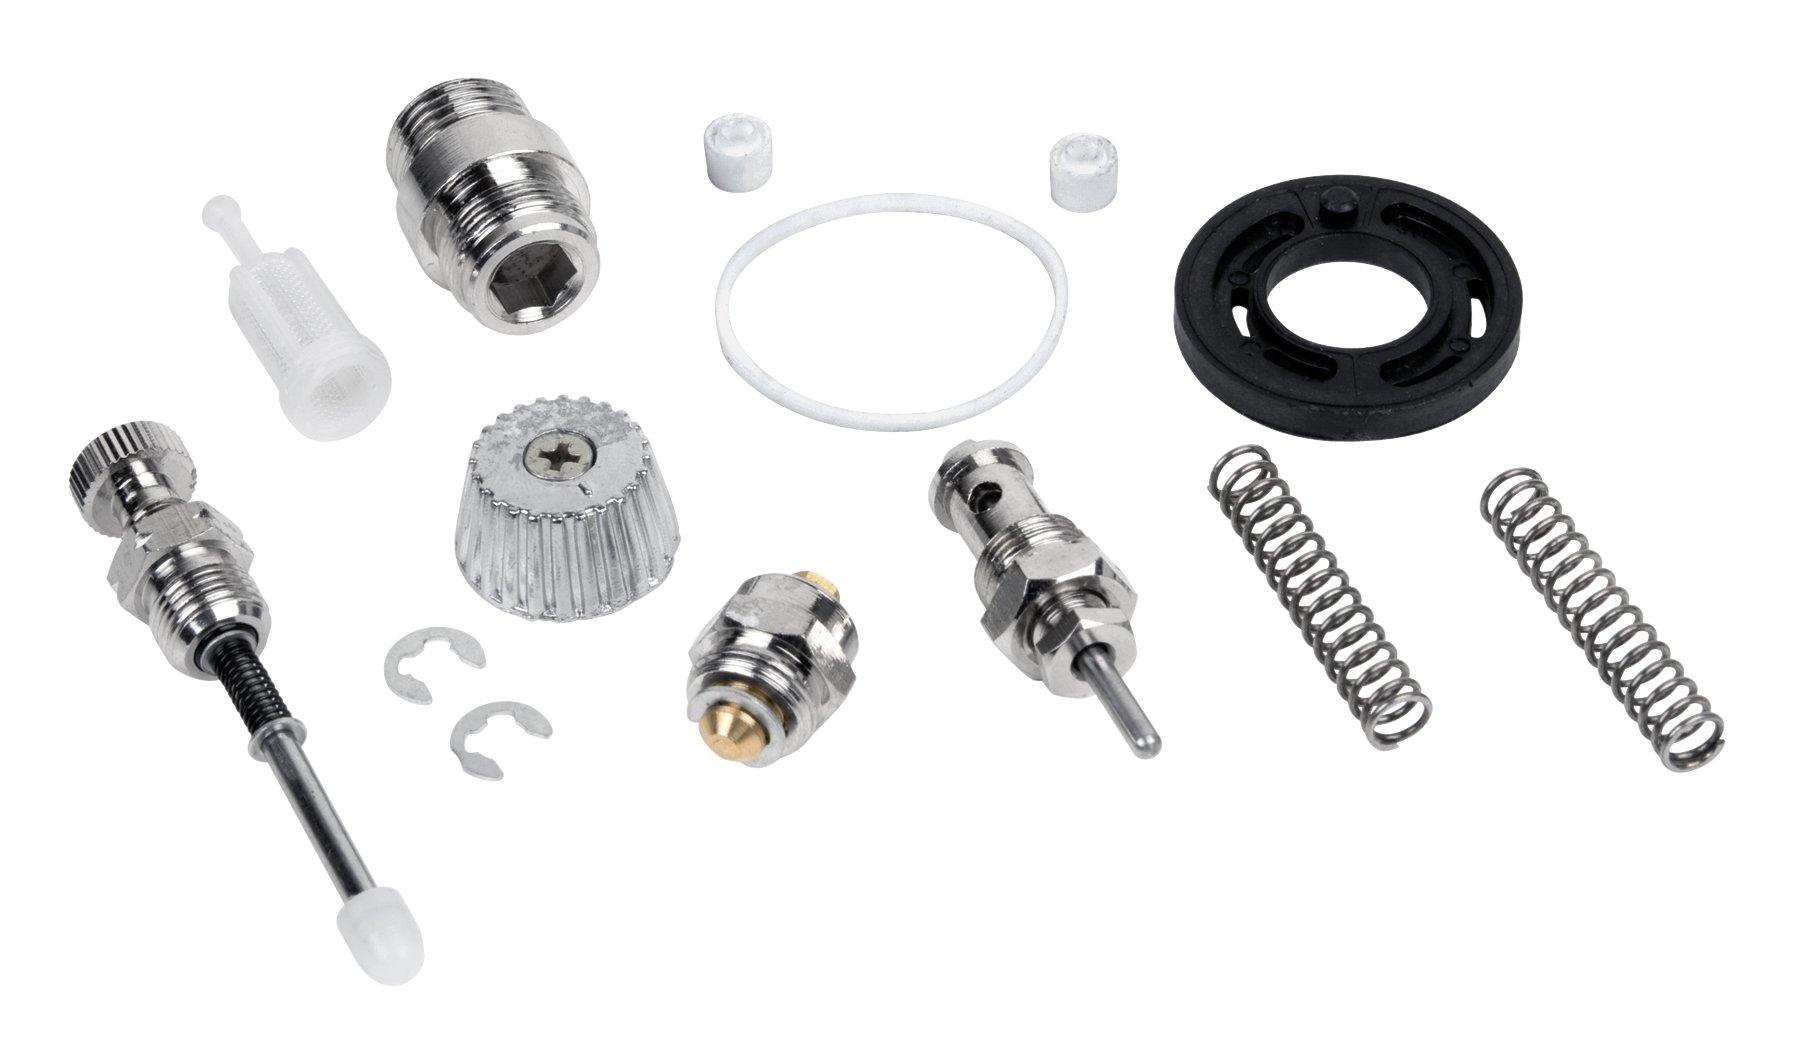 Performance Tool M710K Spray Gun Rebuild Kit for Model Numbers: M708, M710 & M711